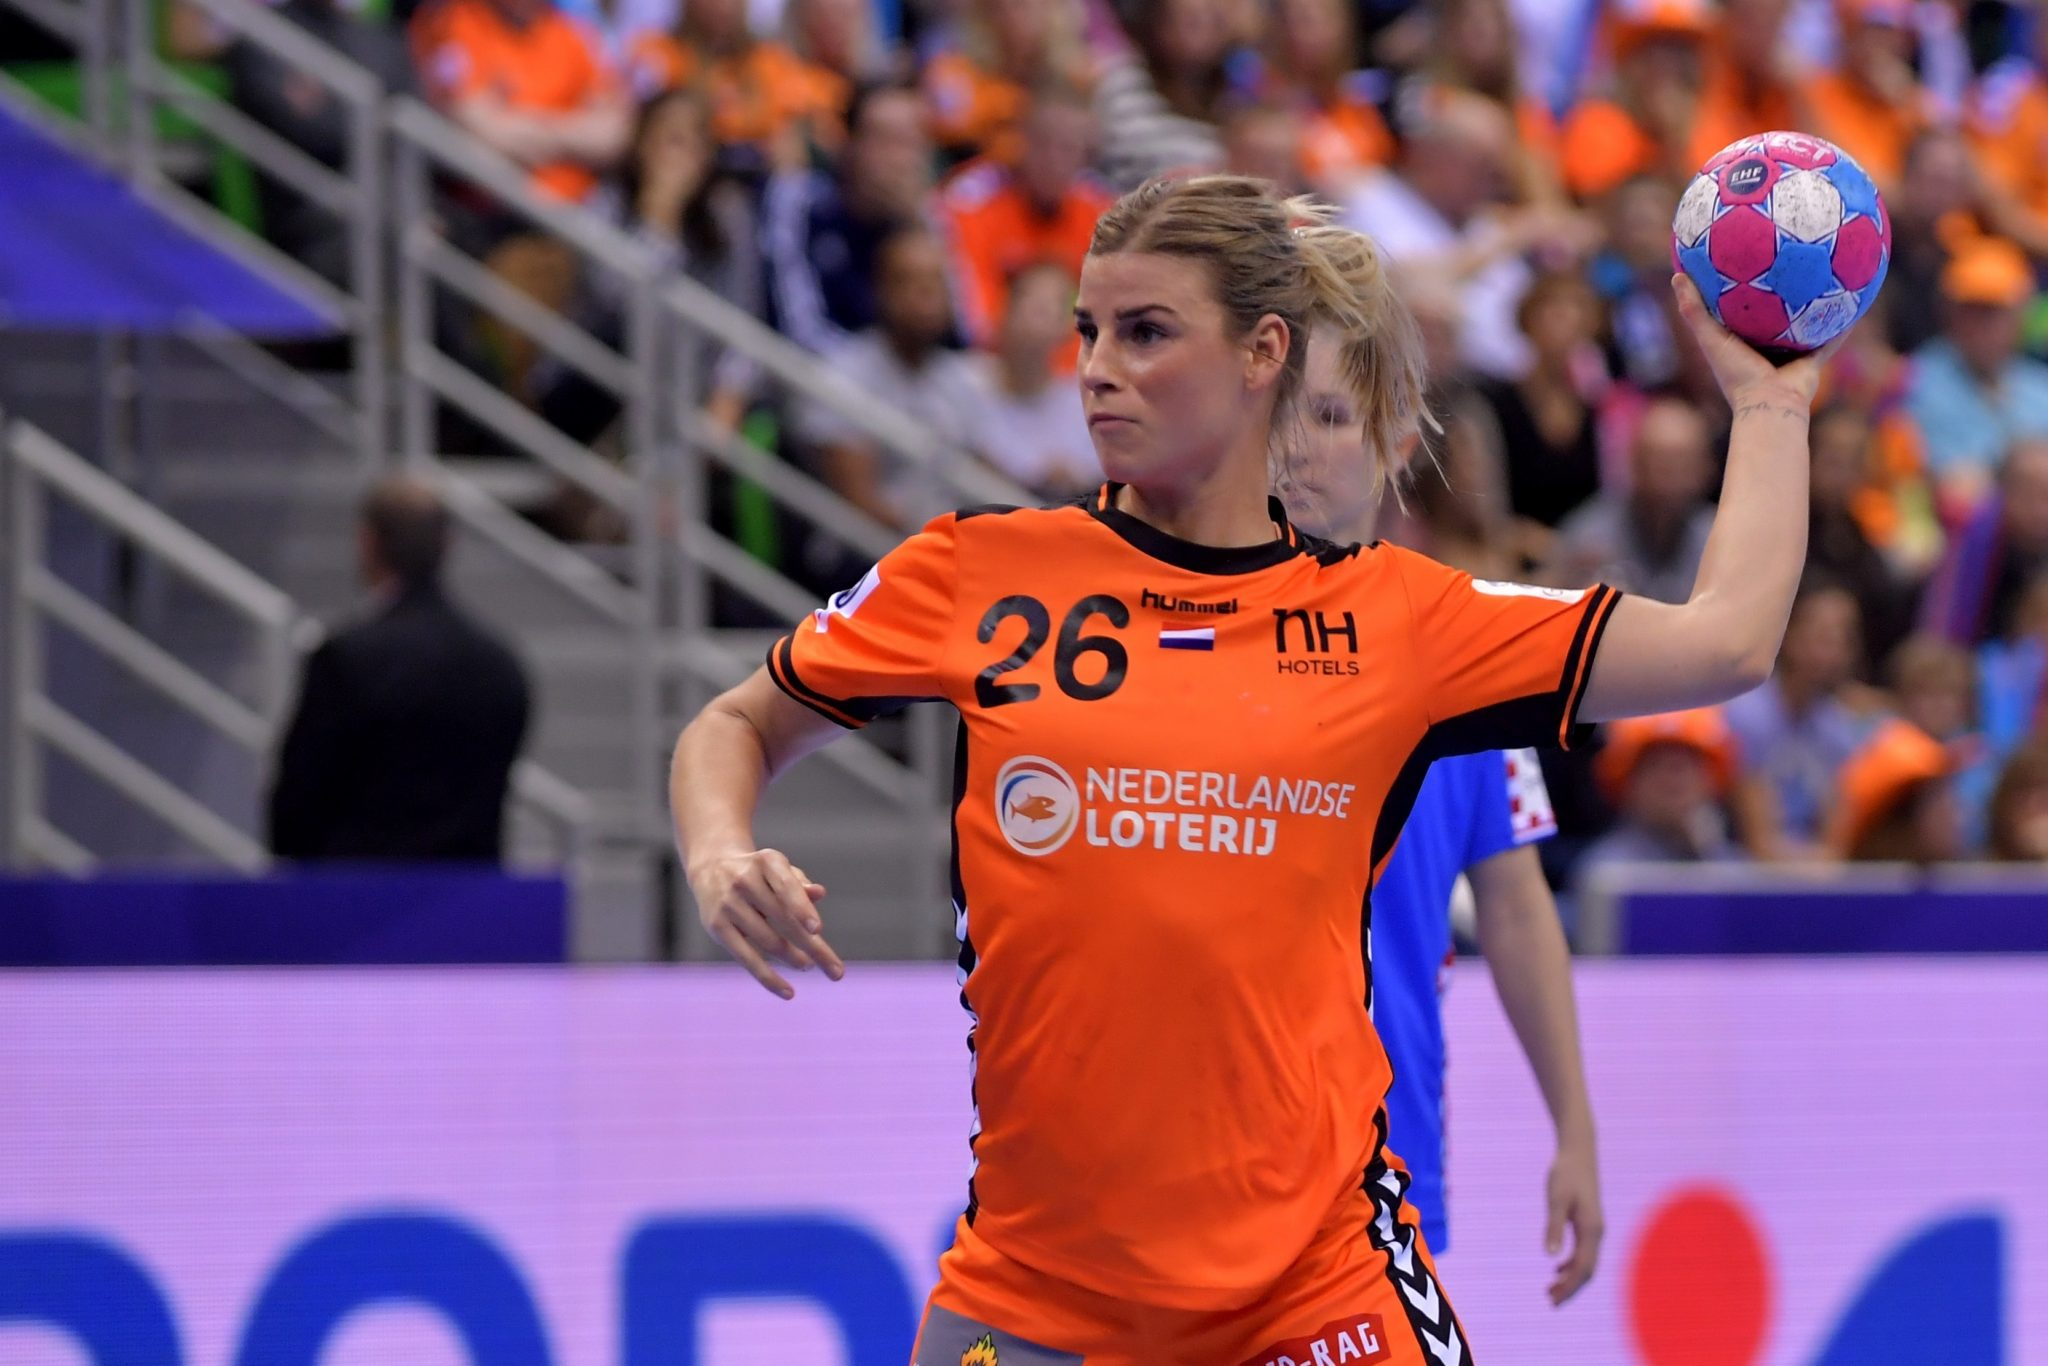 5-12-2018 HANDBAL:NEDERLAND-KROATIE:MONTBELIARD EK Handbal In Frankrijk, Voorronde Groep C Nederland - Kroatie Angela Malestein #26 NED